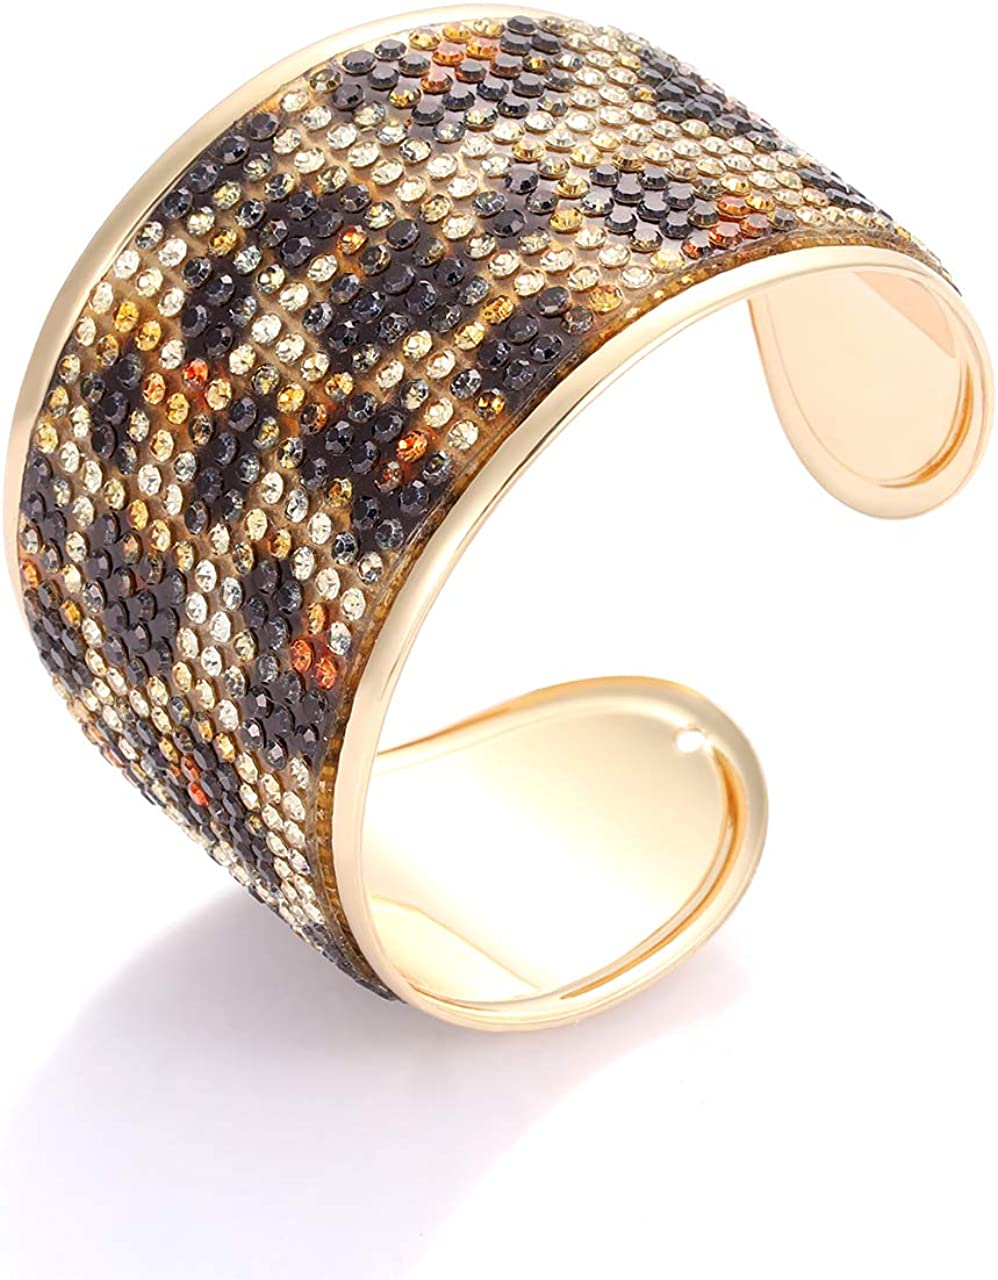 ZITULRY Leopard Print Cuff Bracelet for Women Resin Cheetah Prin